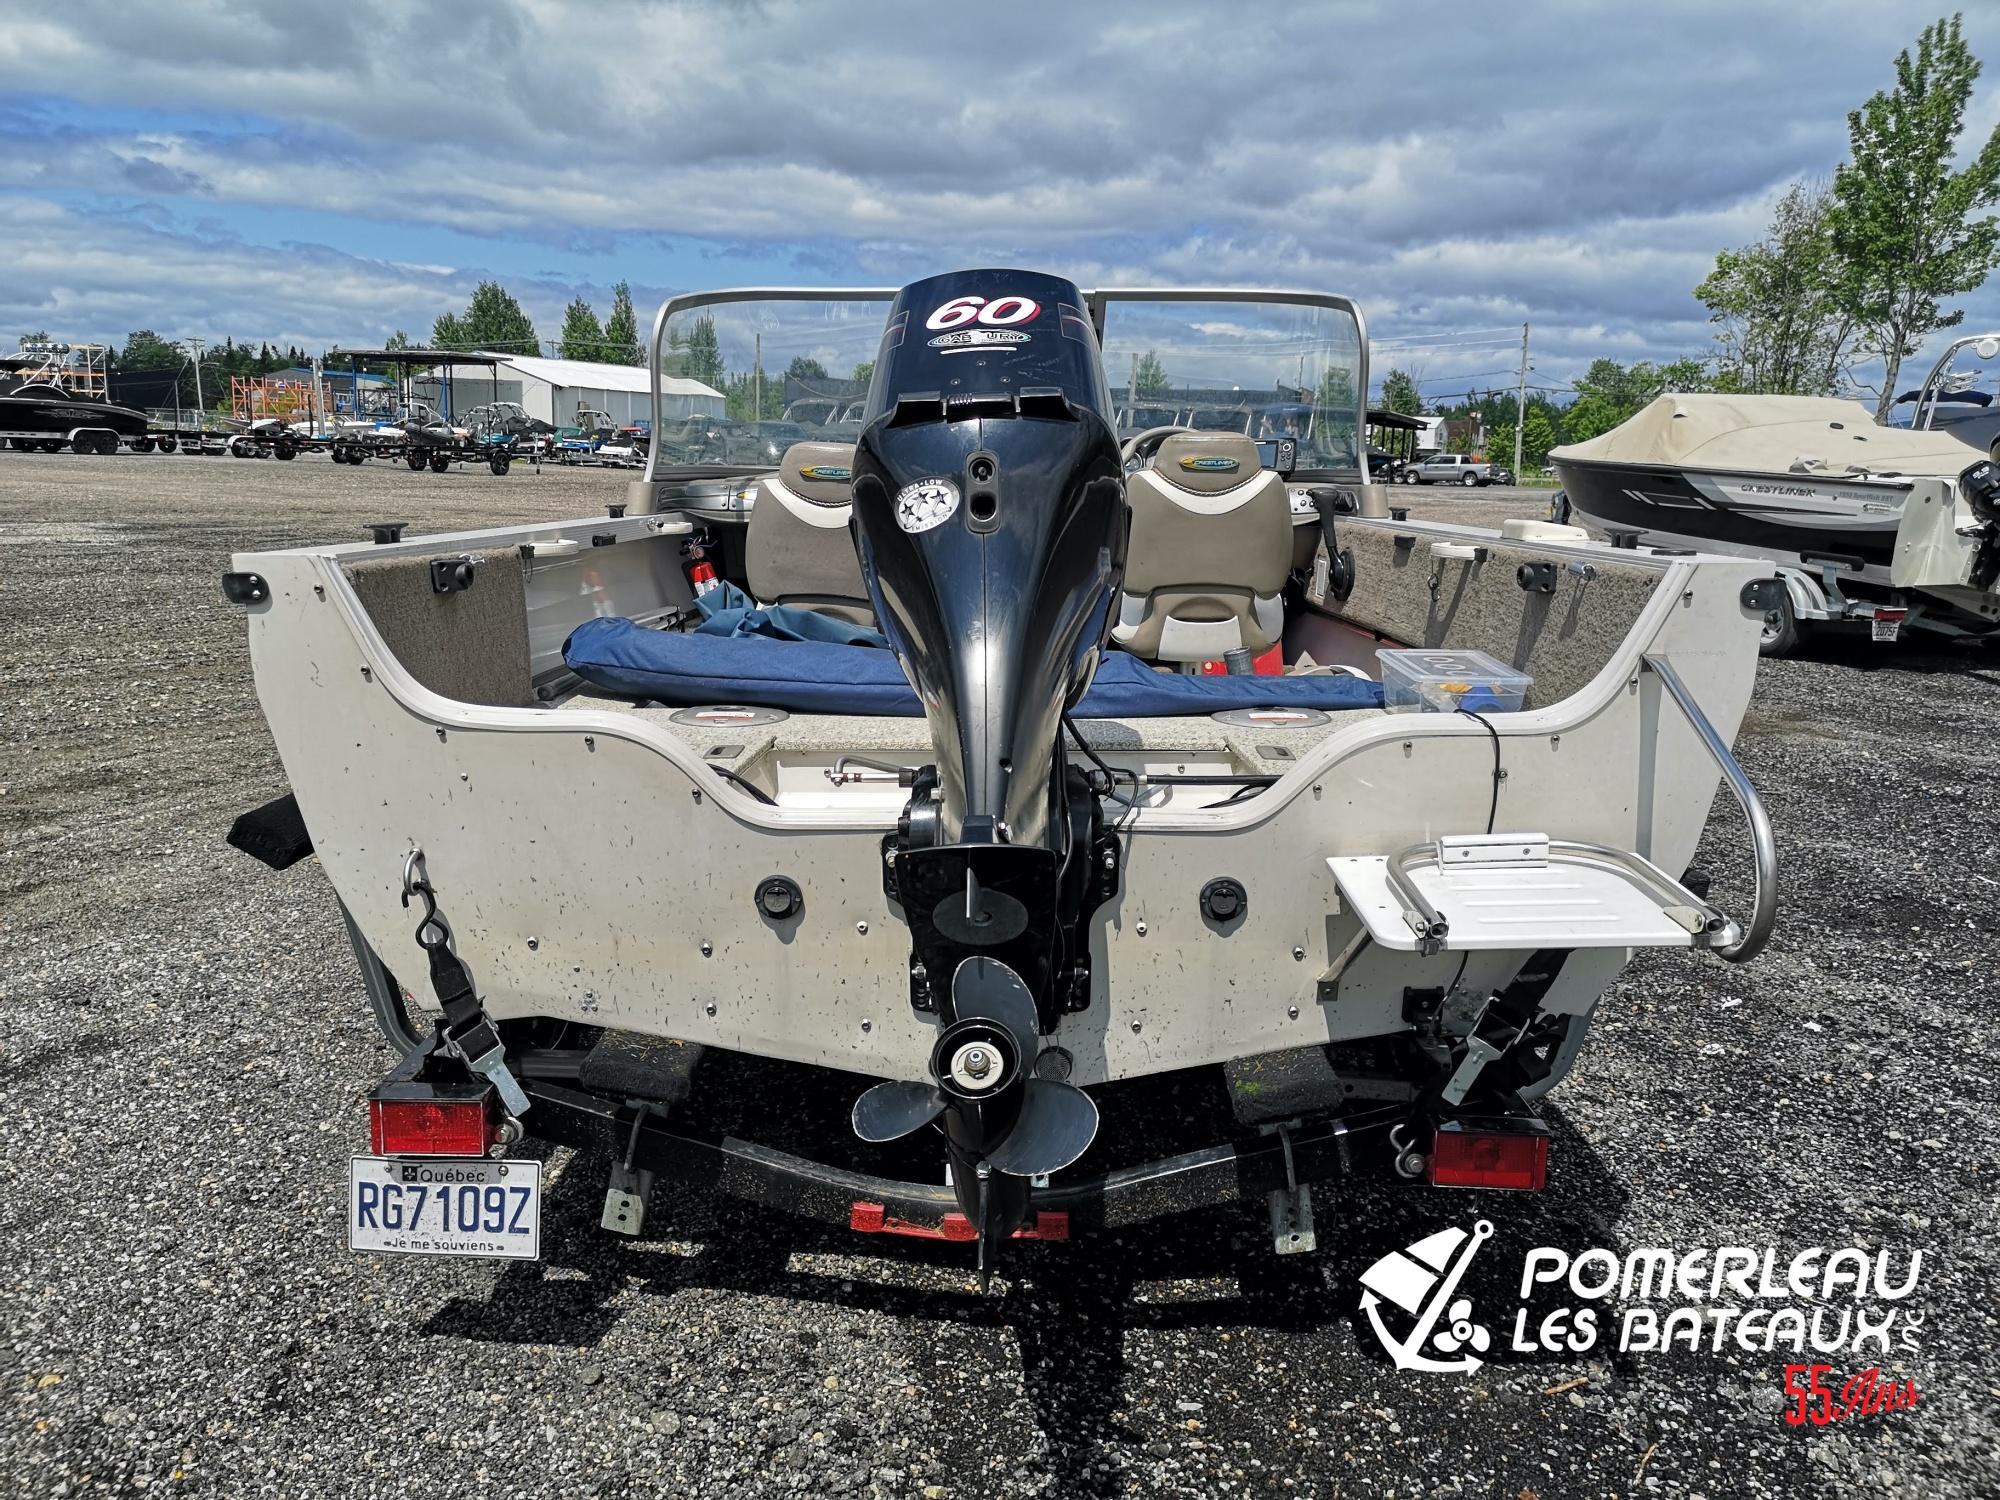 Crestliner Sport Angler 1650 - IMG_20210716_111133